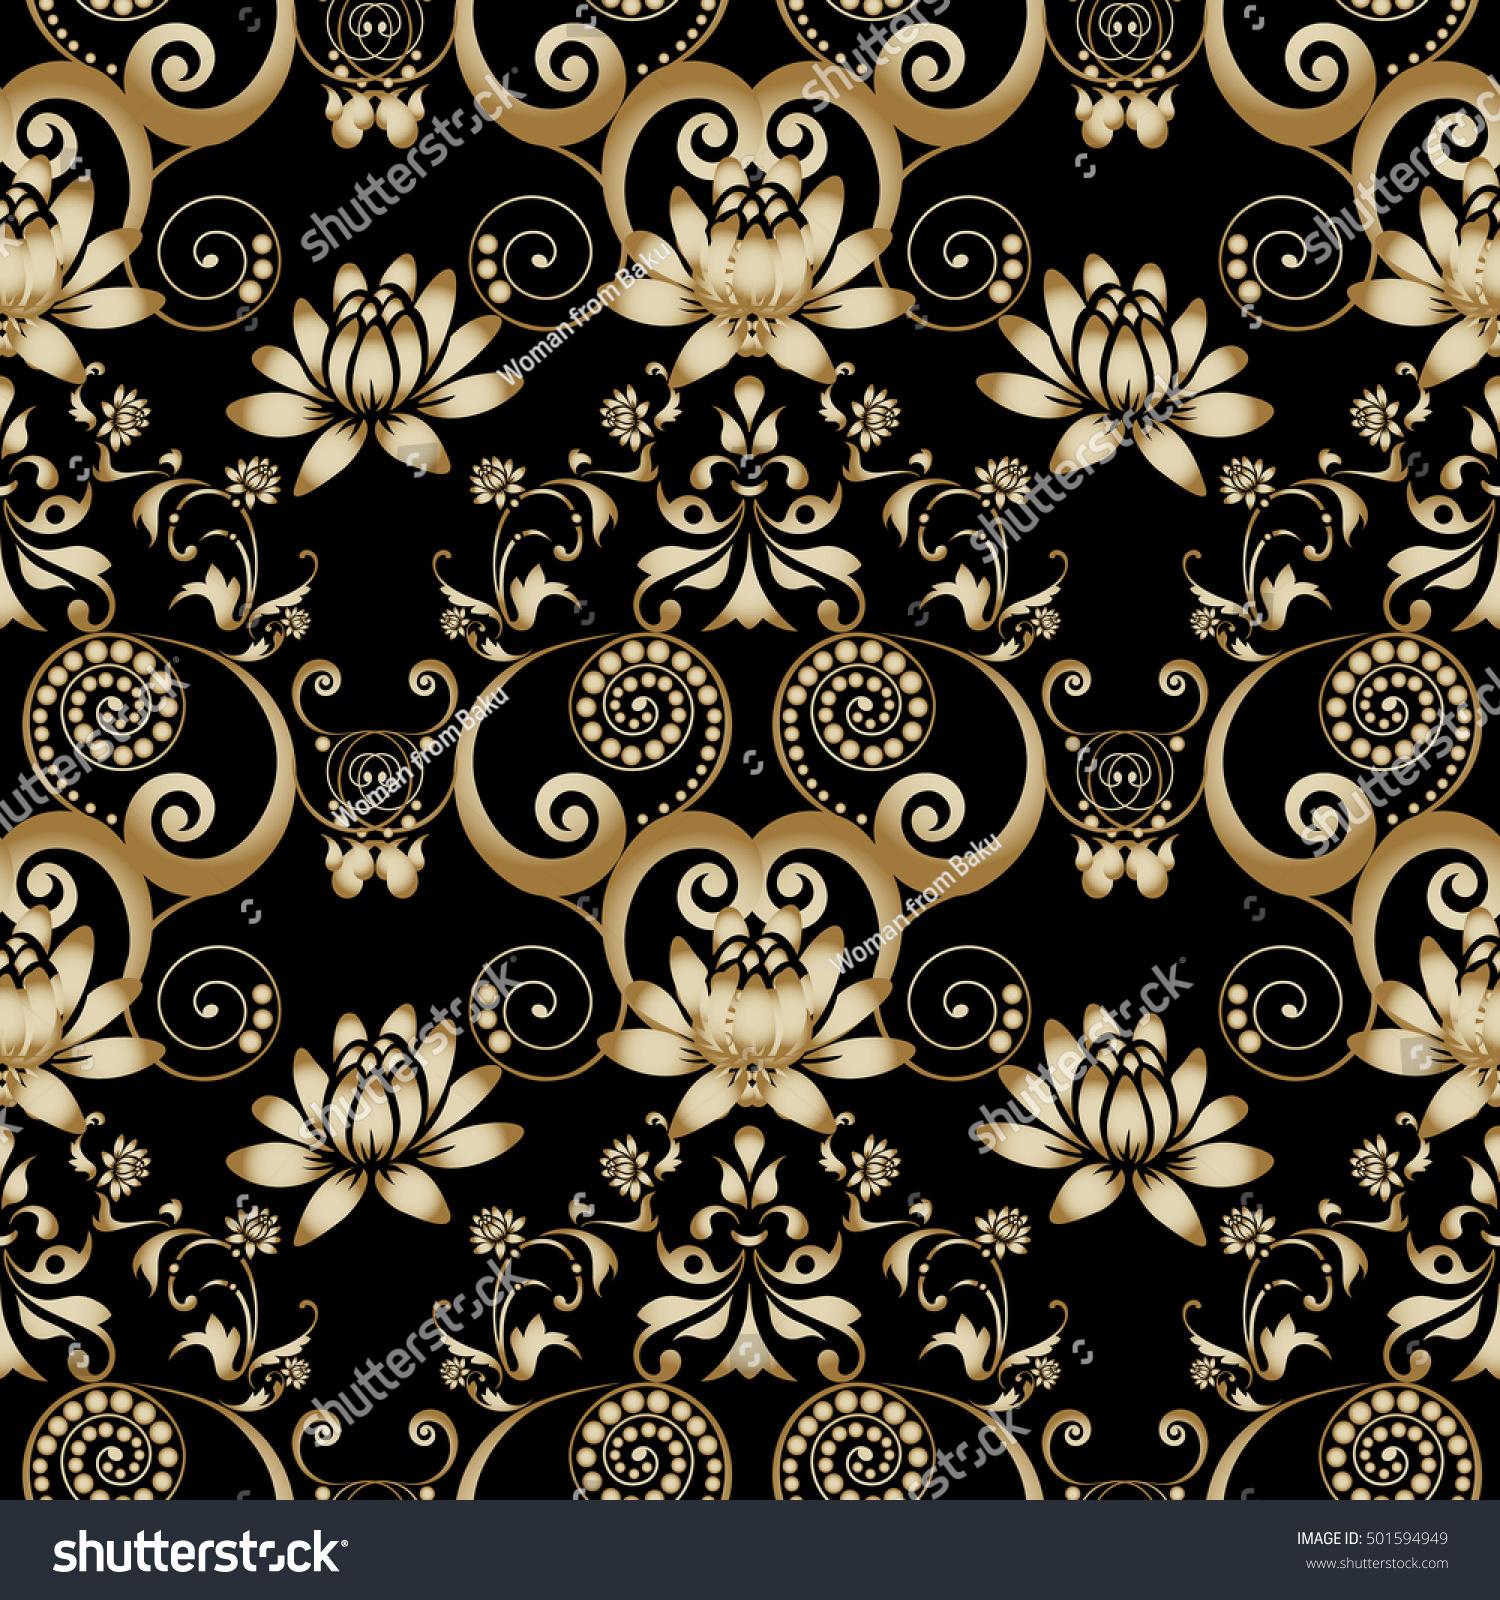 Luxury Black Floral Baroque Damask Vector Stock Vector Royalty